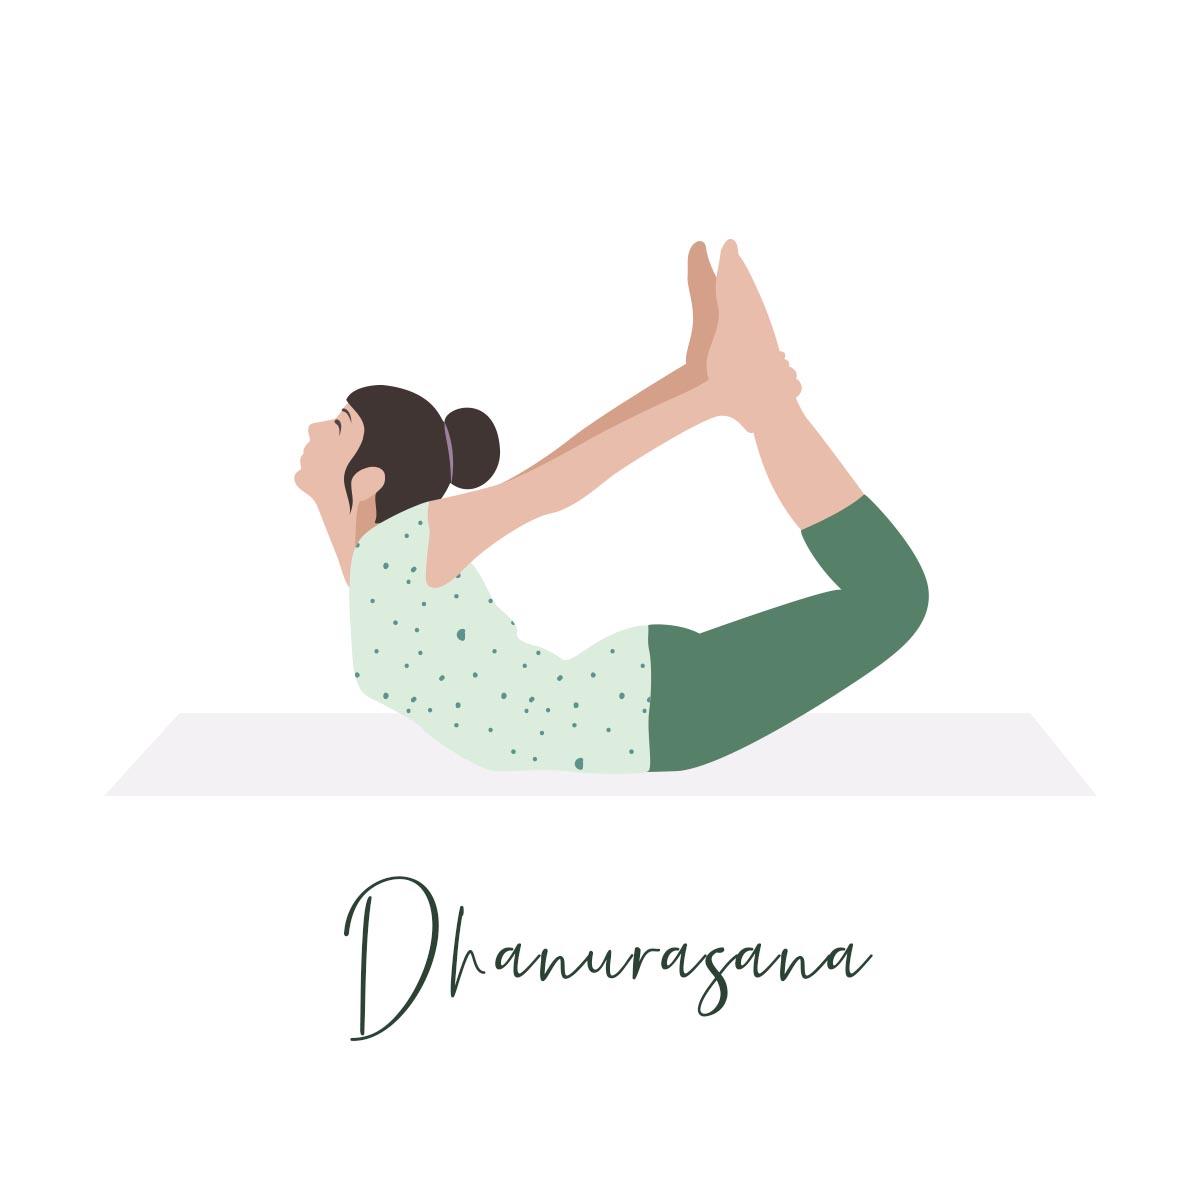 Dhanurasana illustration